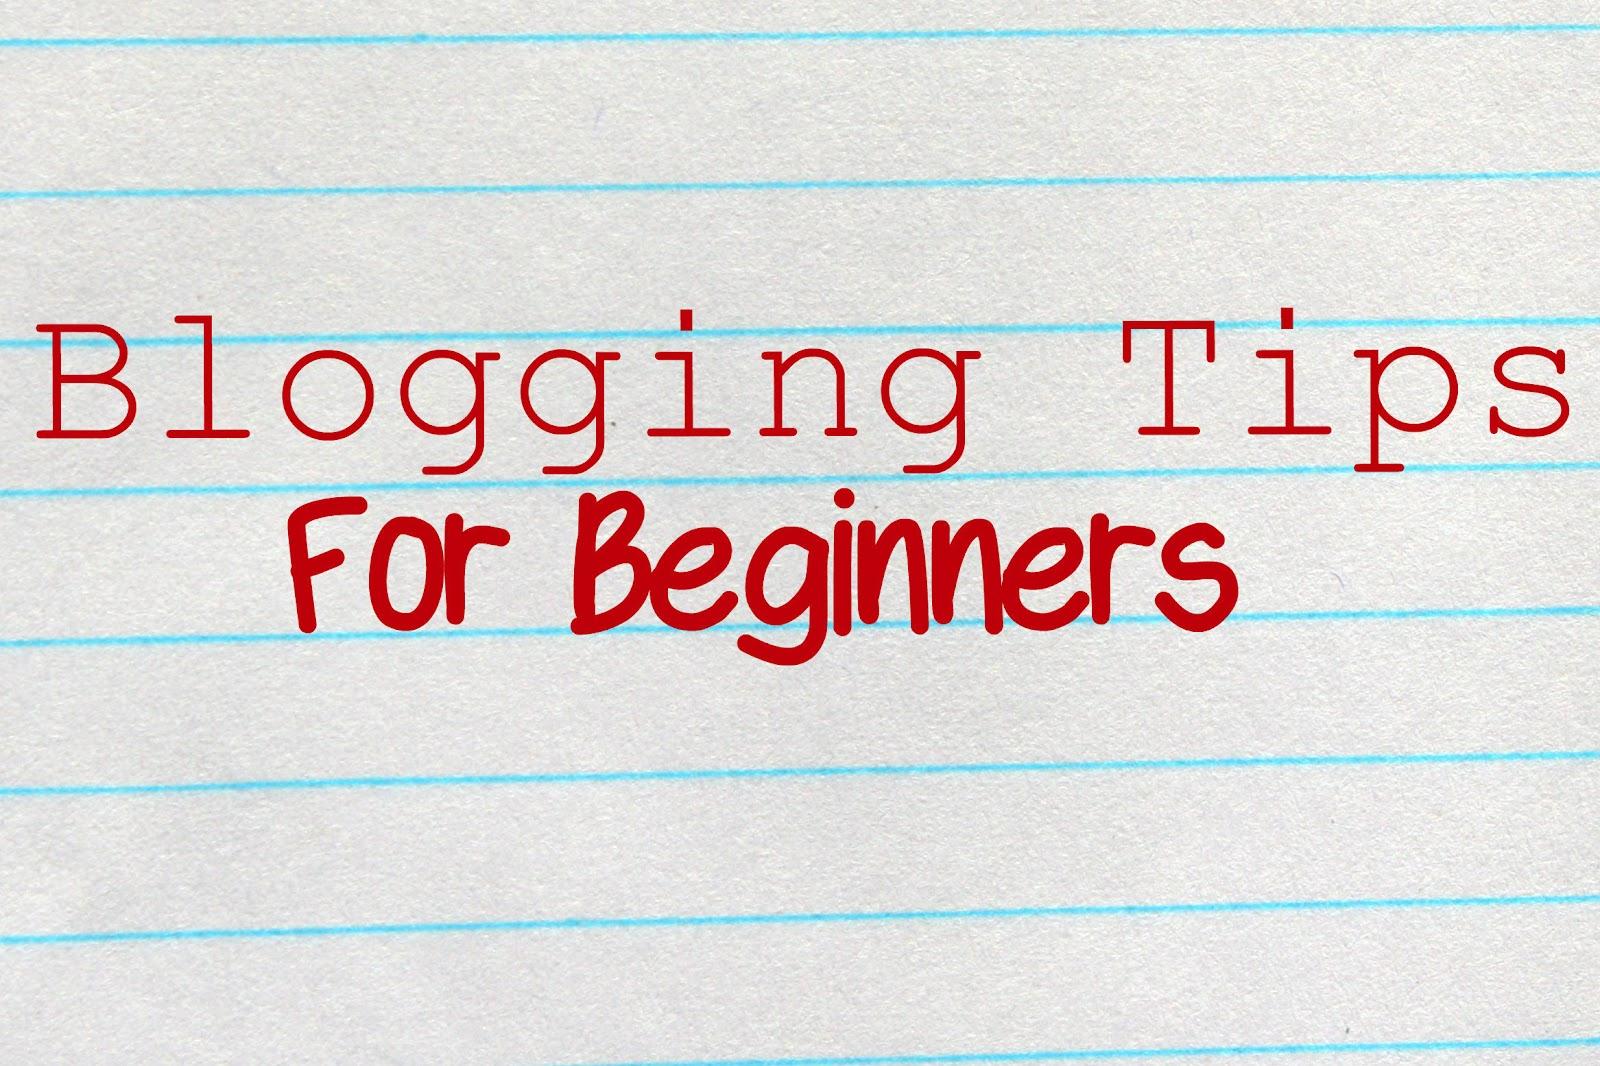 Blogging-Tips-for-Beginners1